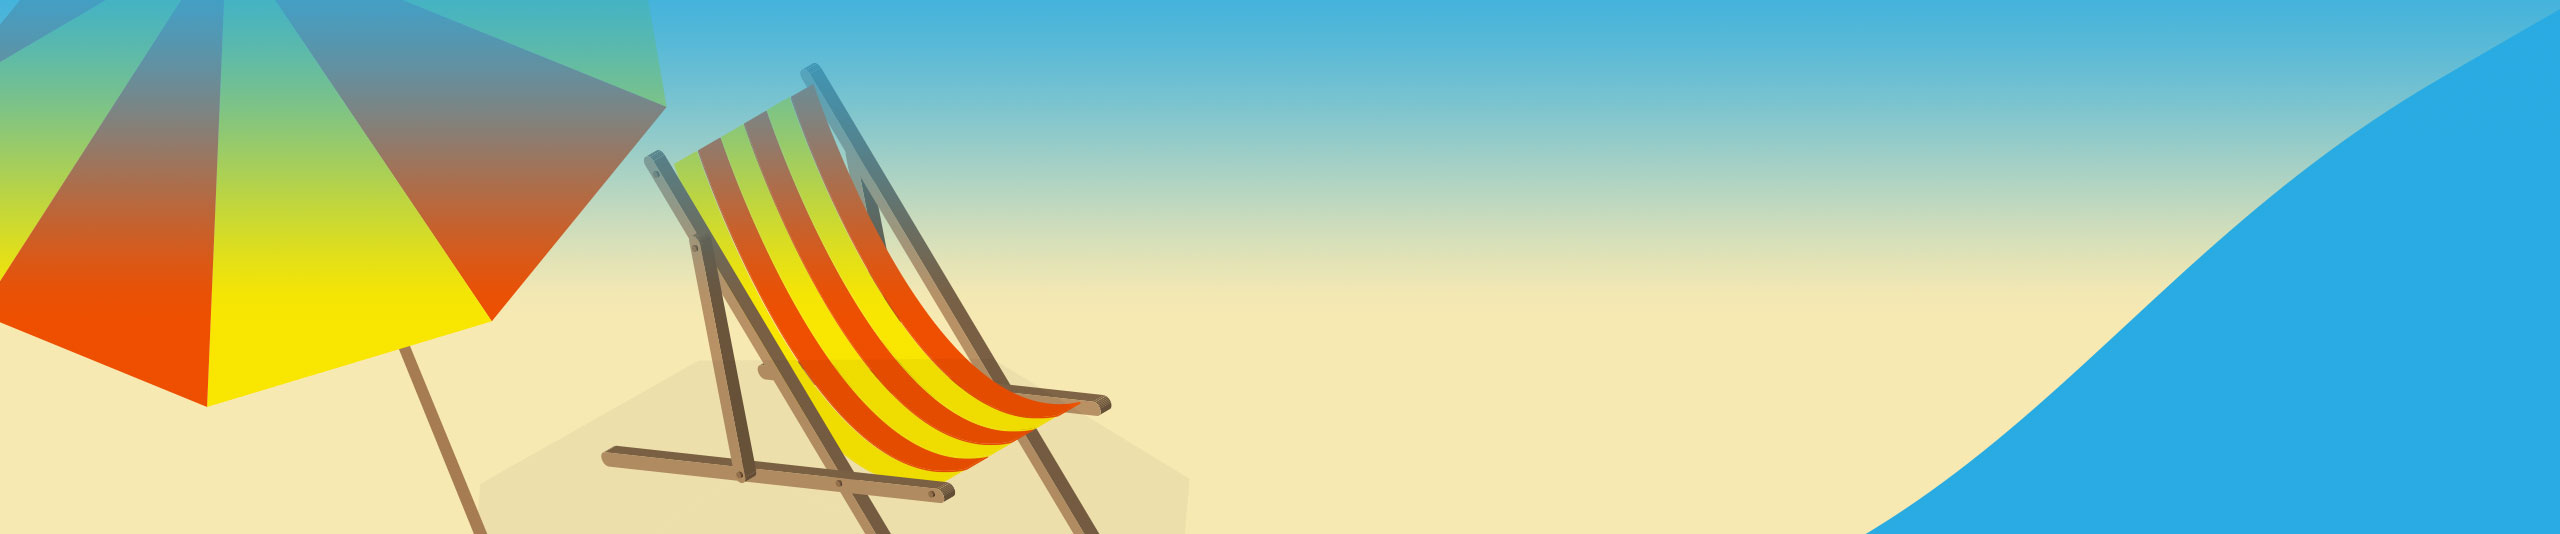 Isometric Beach Chair with Sun Umbrella in Adobe Illustrator